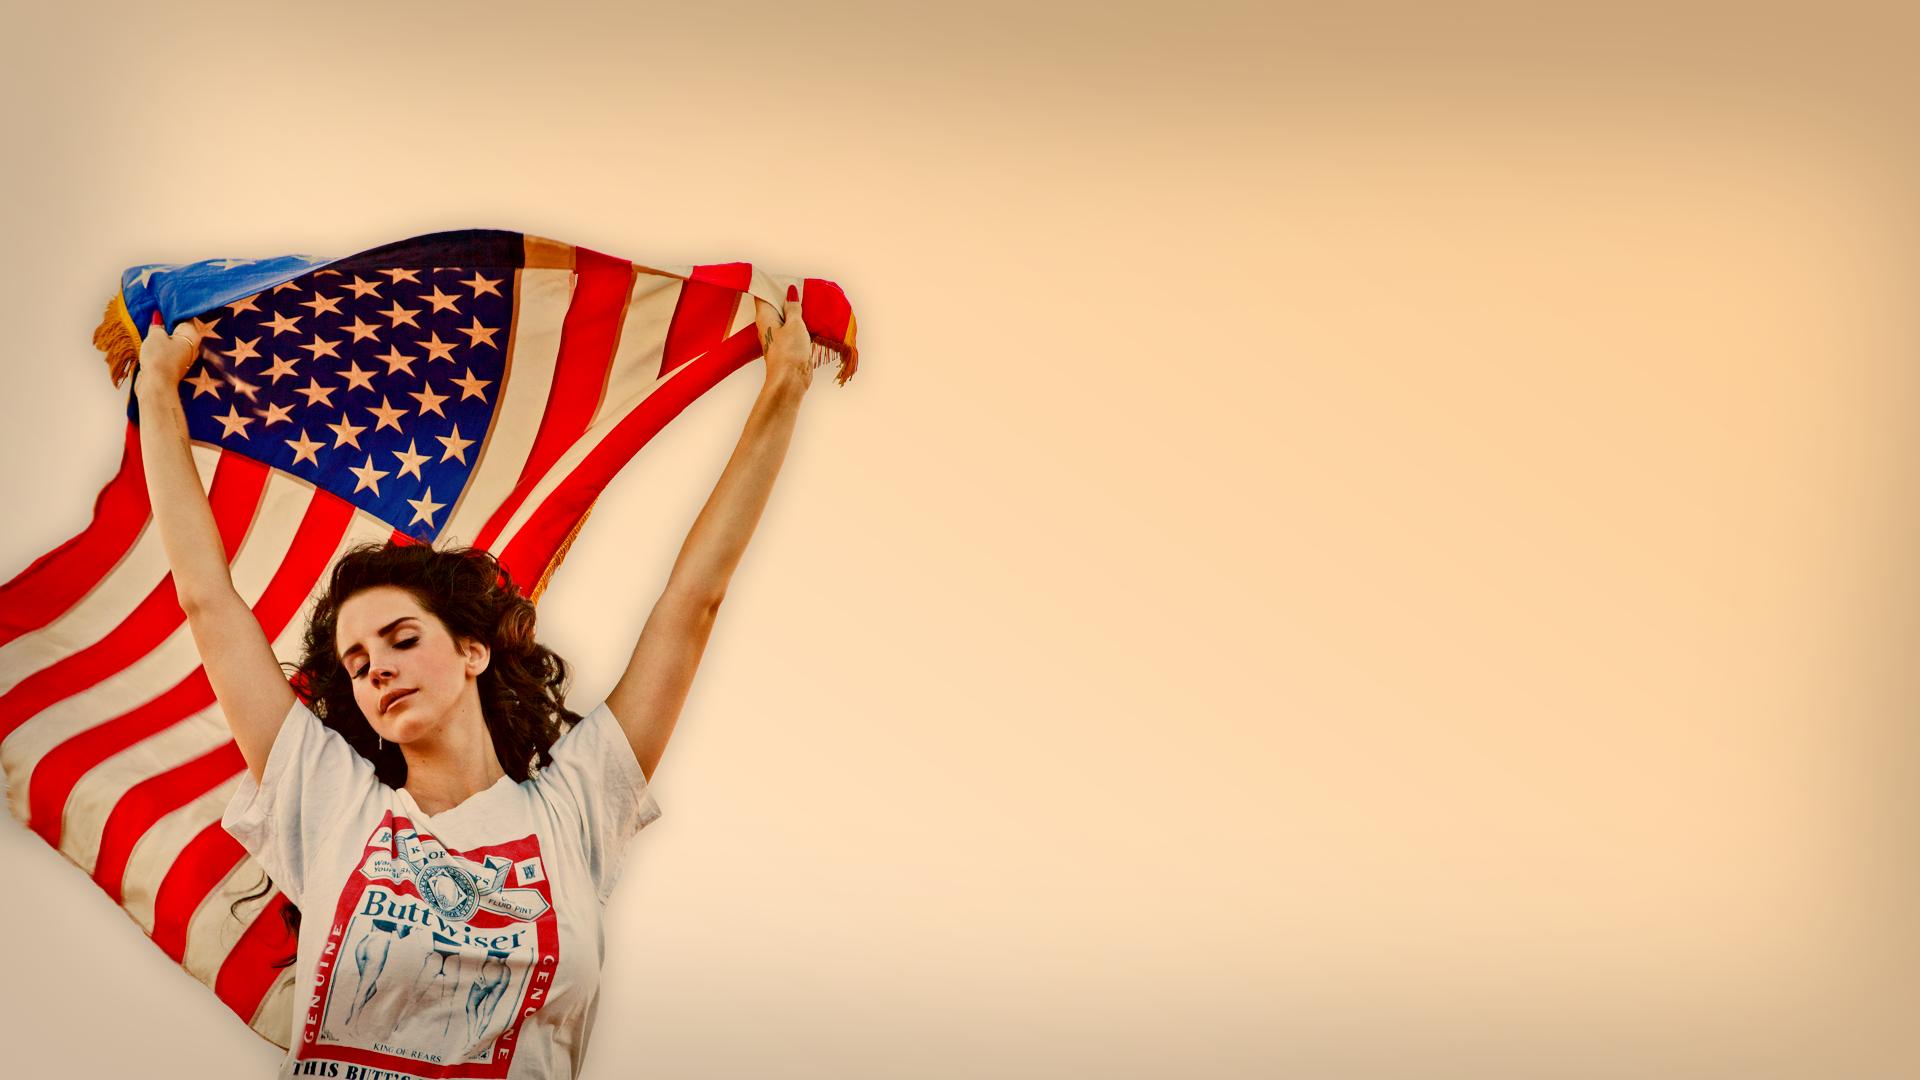 Lana Del Rey Desktop Wallpaper Hd 2203 Wallpaper Risewall Com Lana Del Rey Ride Lana Del Rey Songs Lana Del Rey